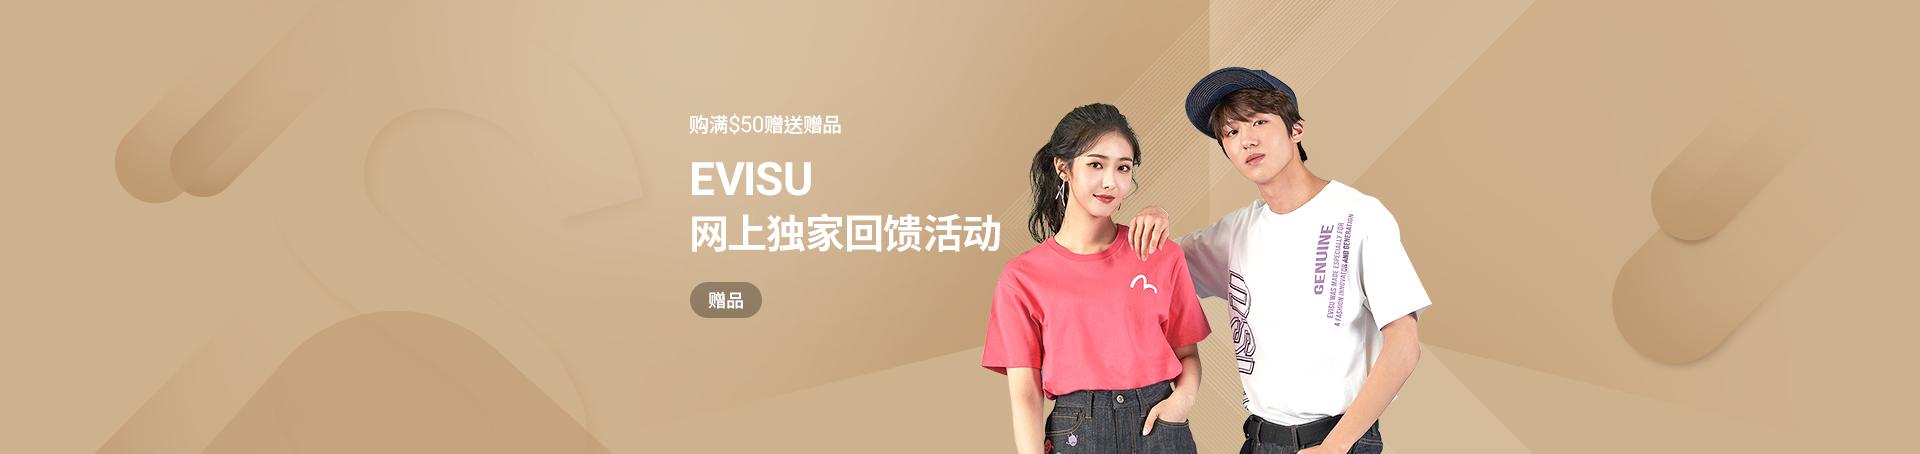 EVISU 网上独家回馈活动